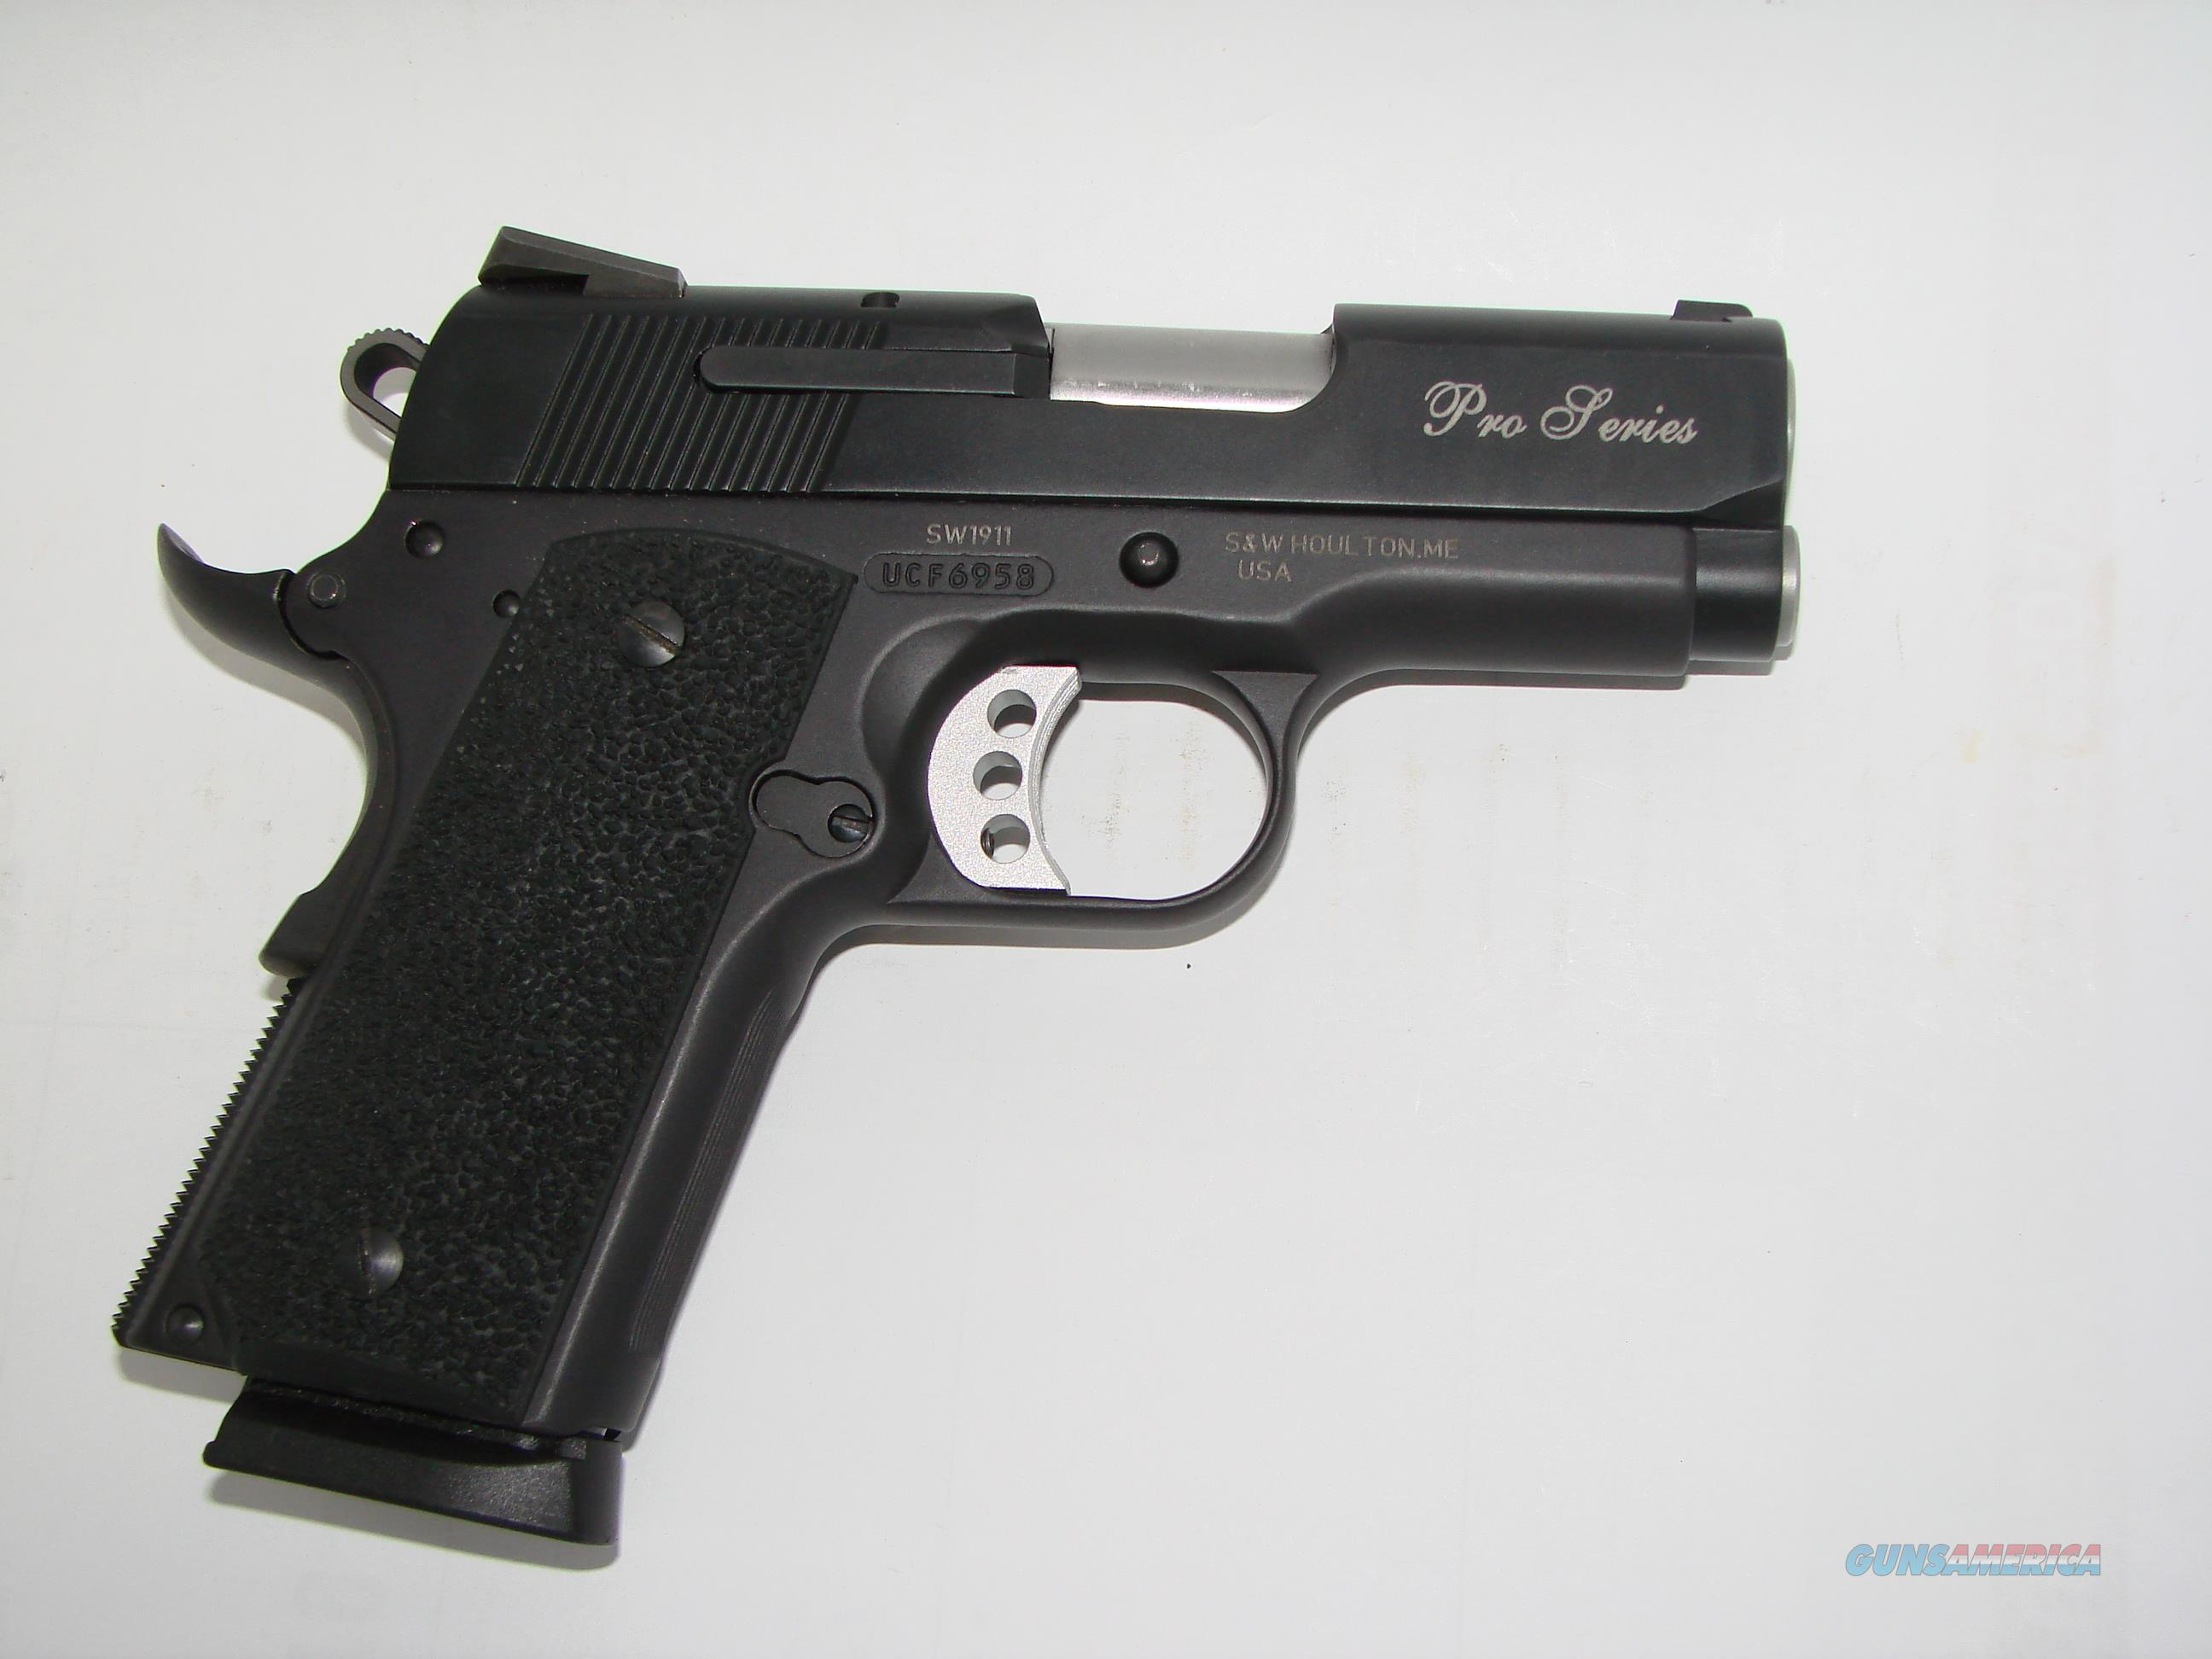 S&W 1911 Subcompact Pro  Guns > Pistols > Smith & Wesson Pistols - Autos > Steel Frame